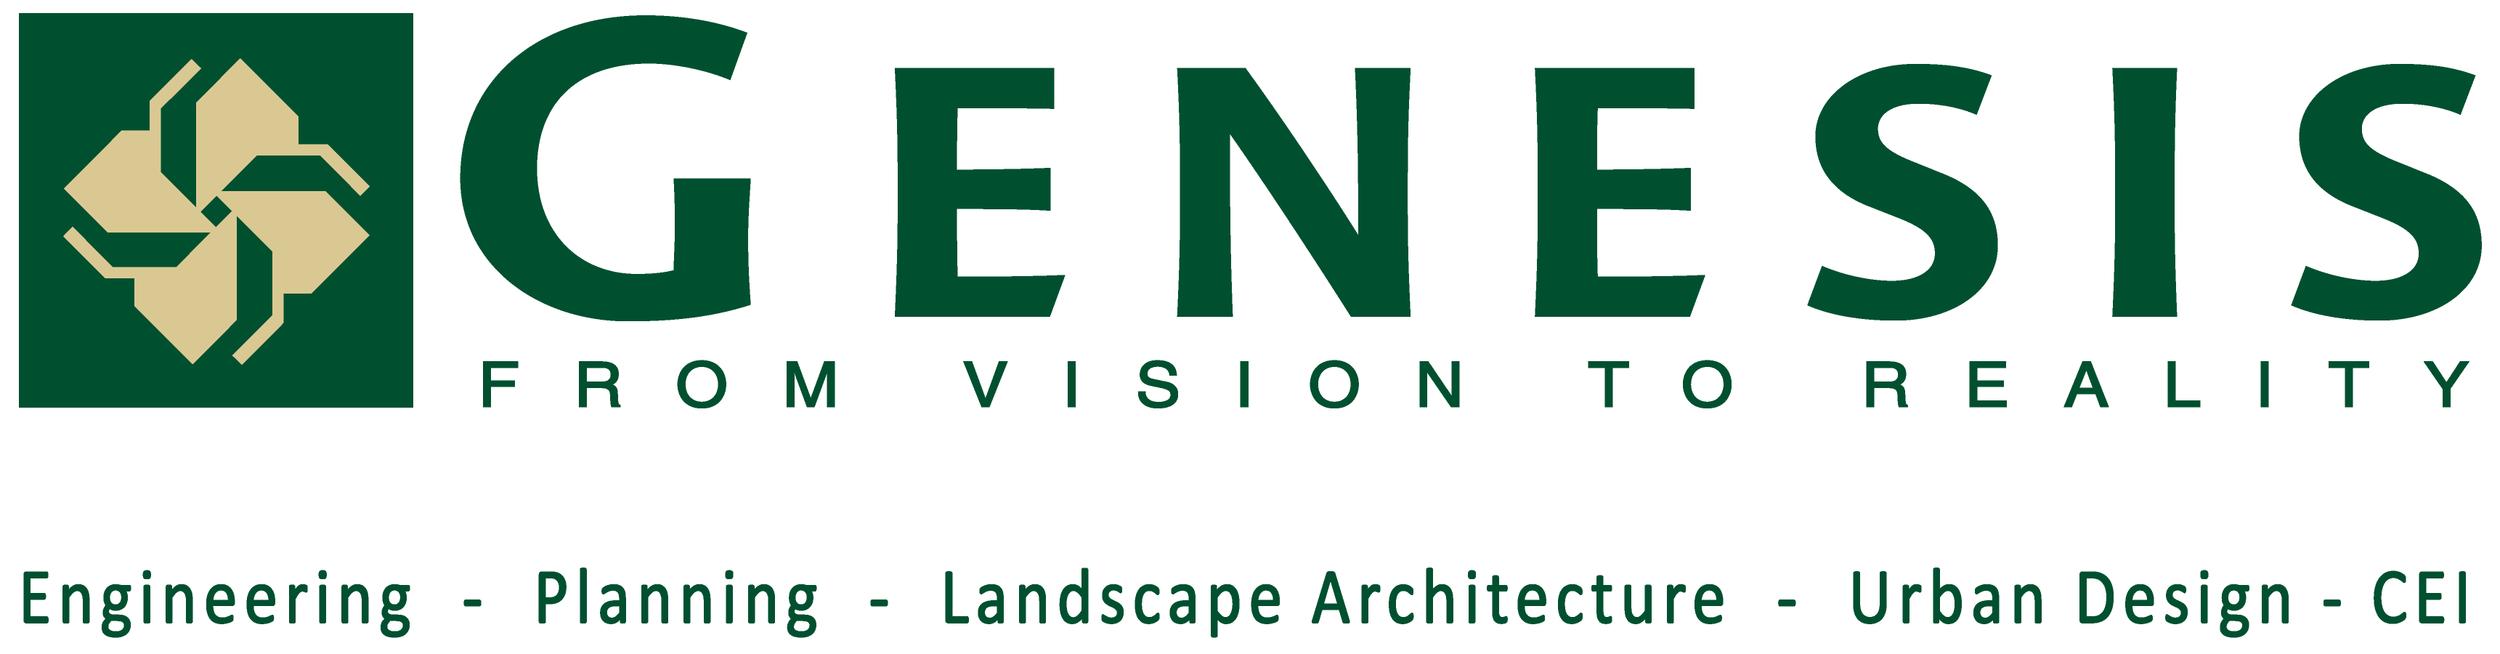 GenesisLogo-2013-Services-Corp_3442x900-white.png